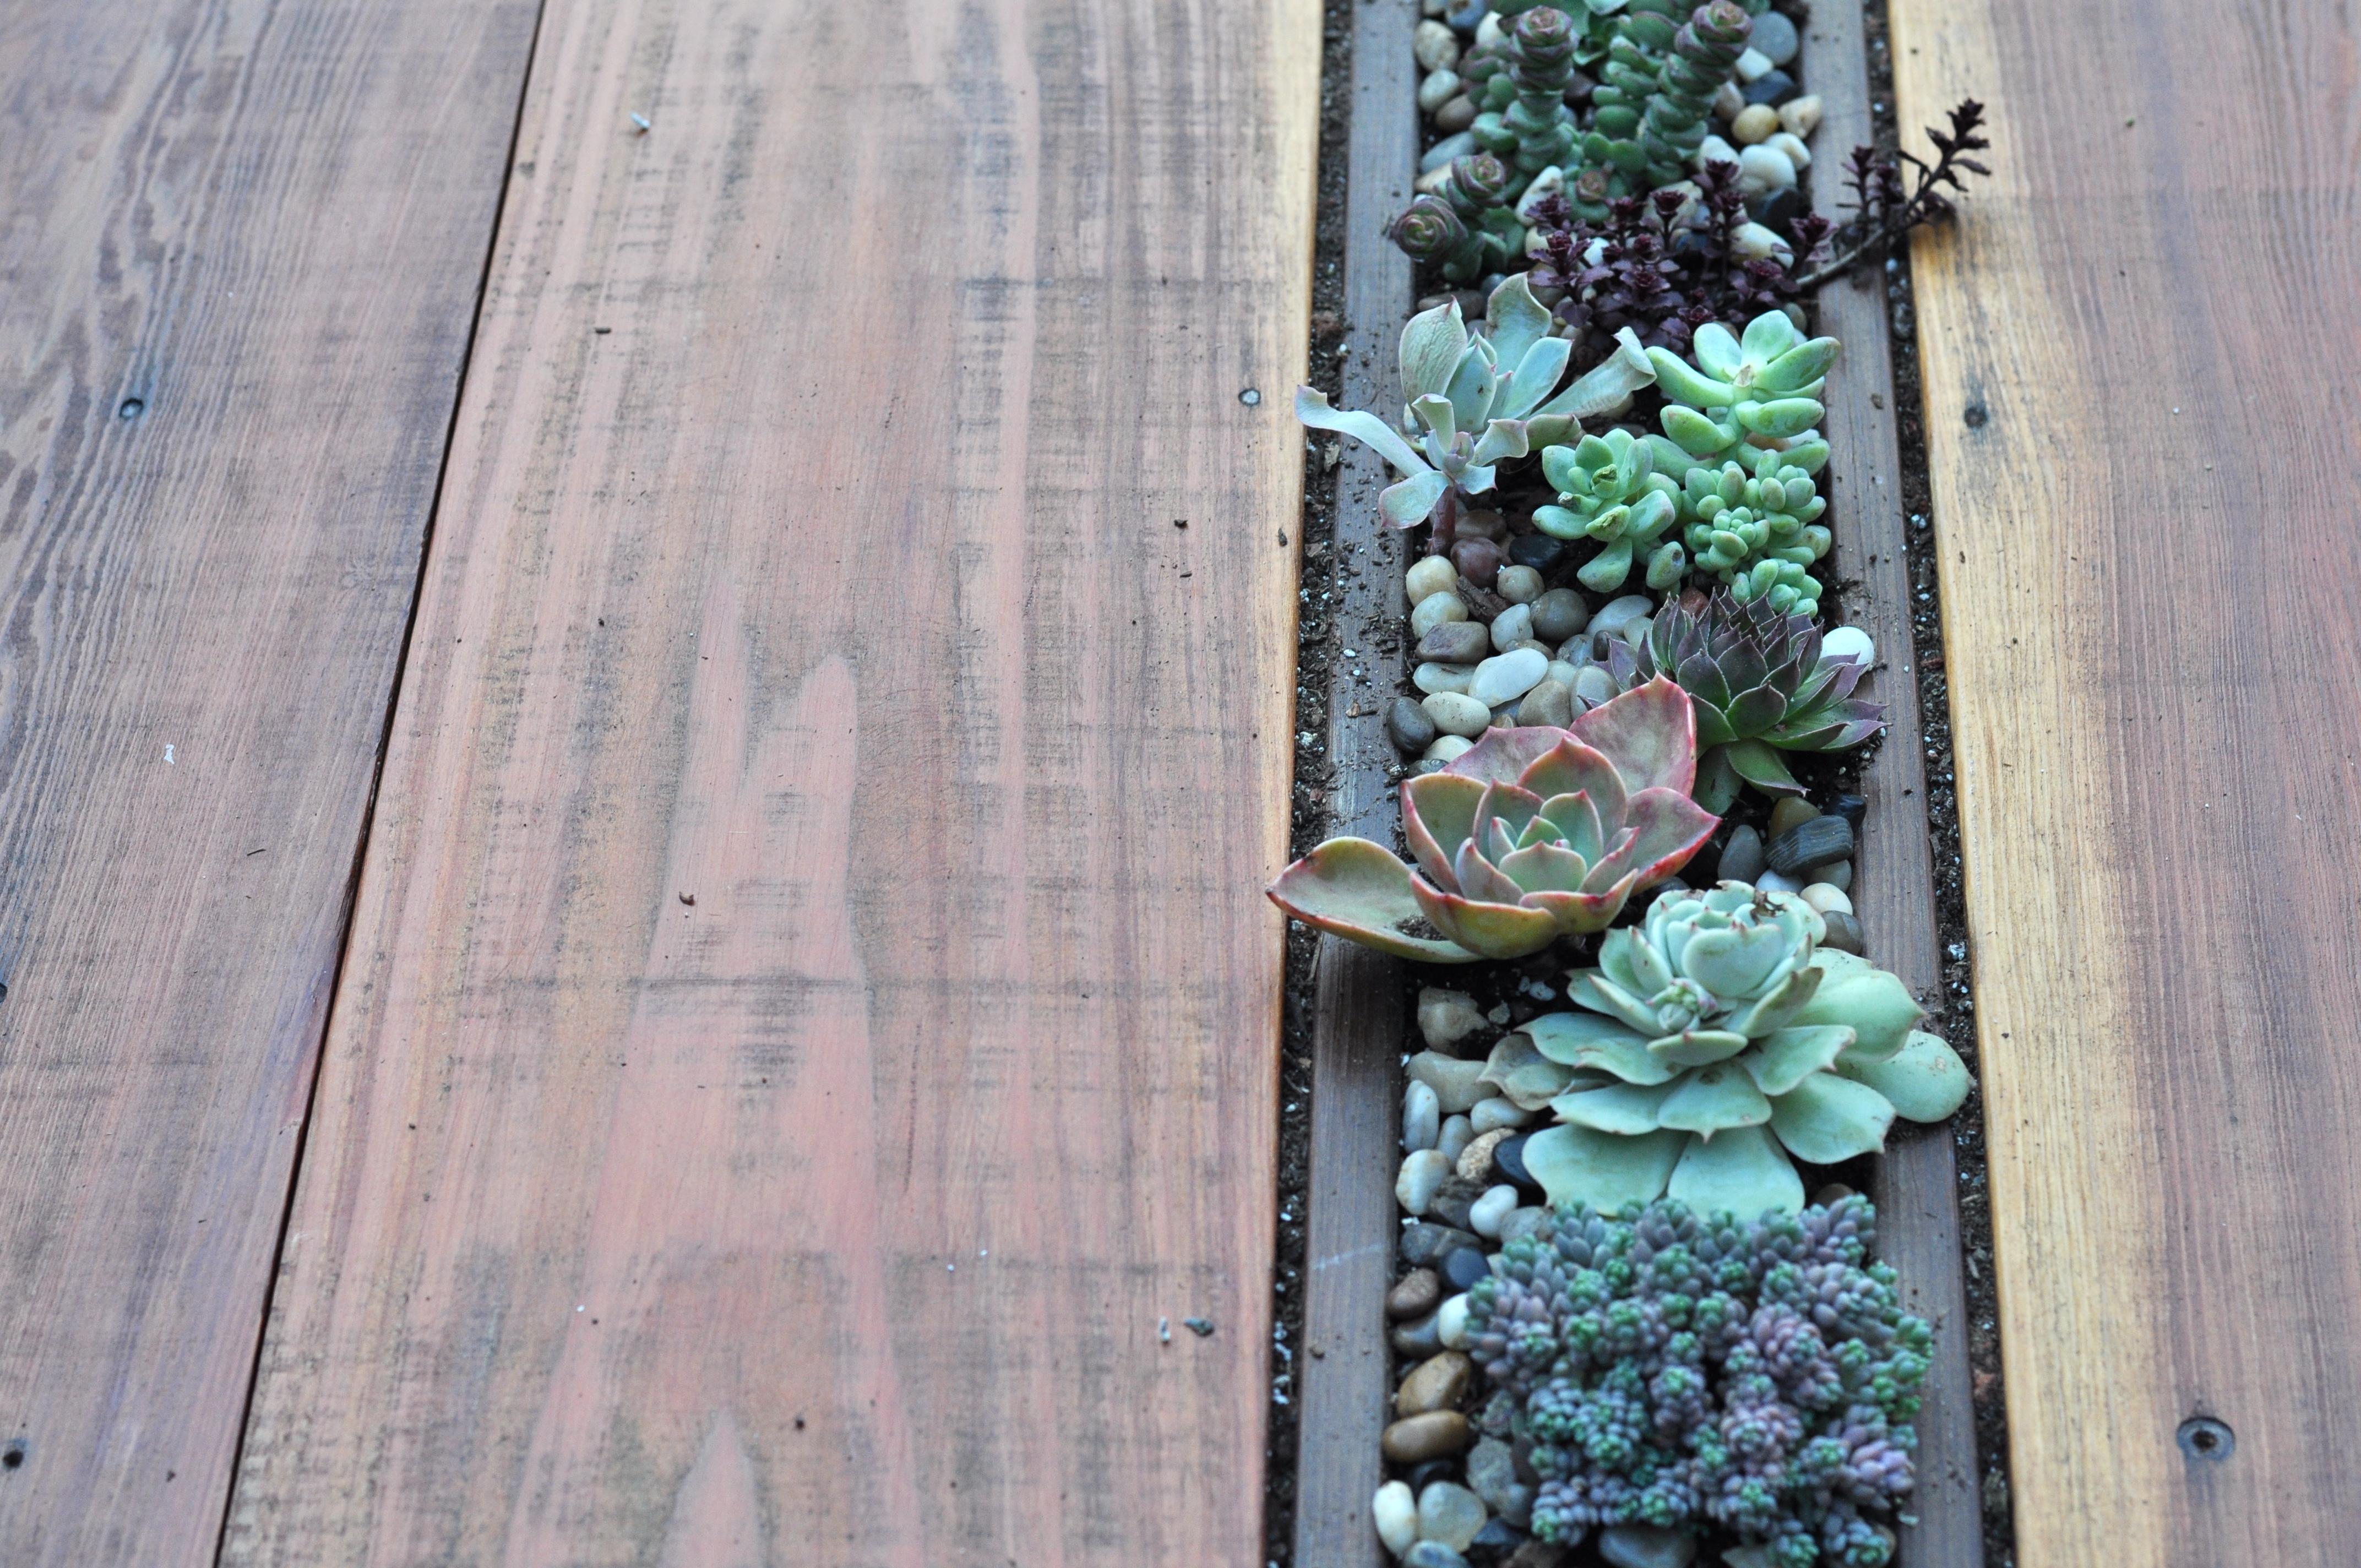 backyard projects clary sage